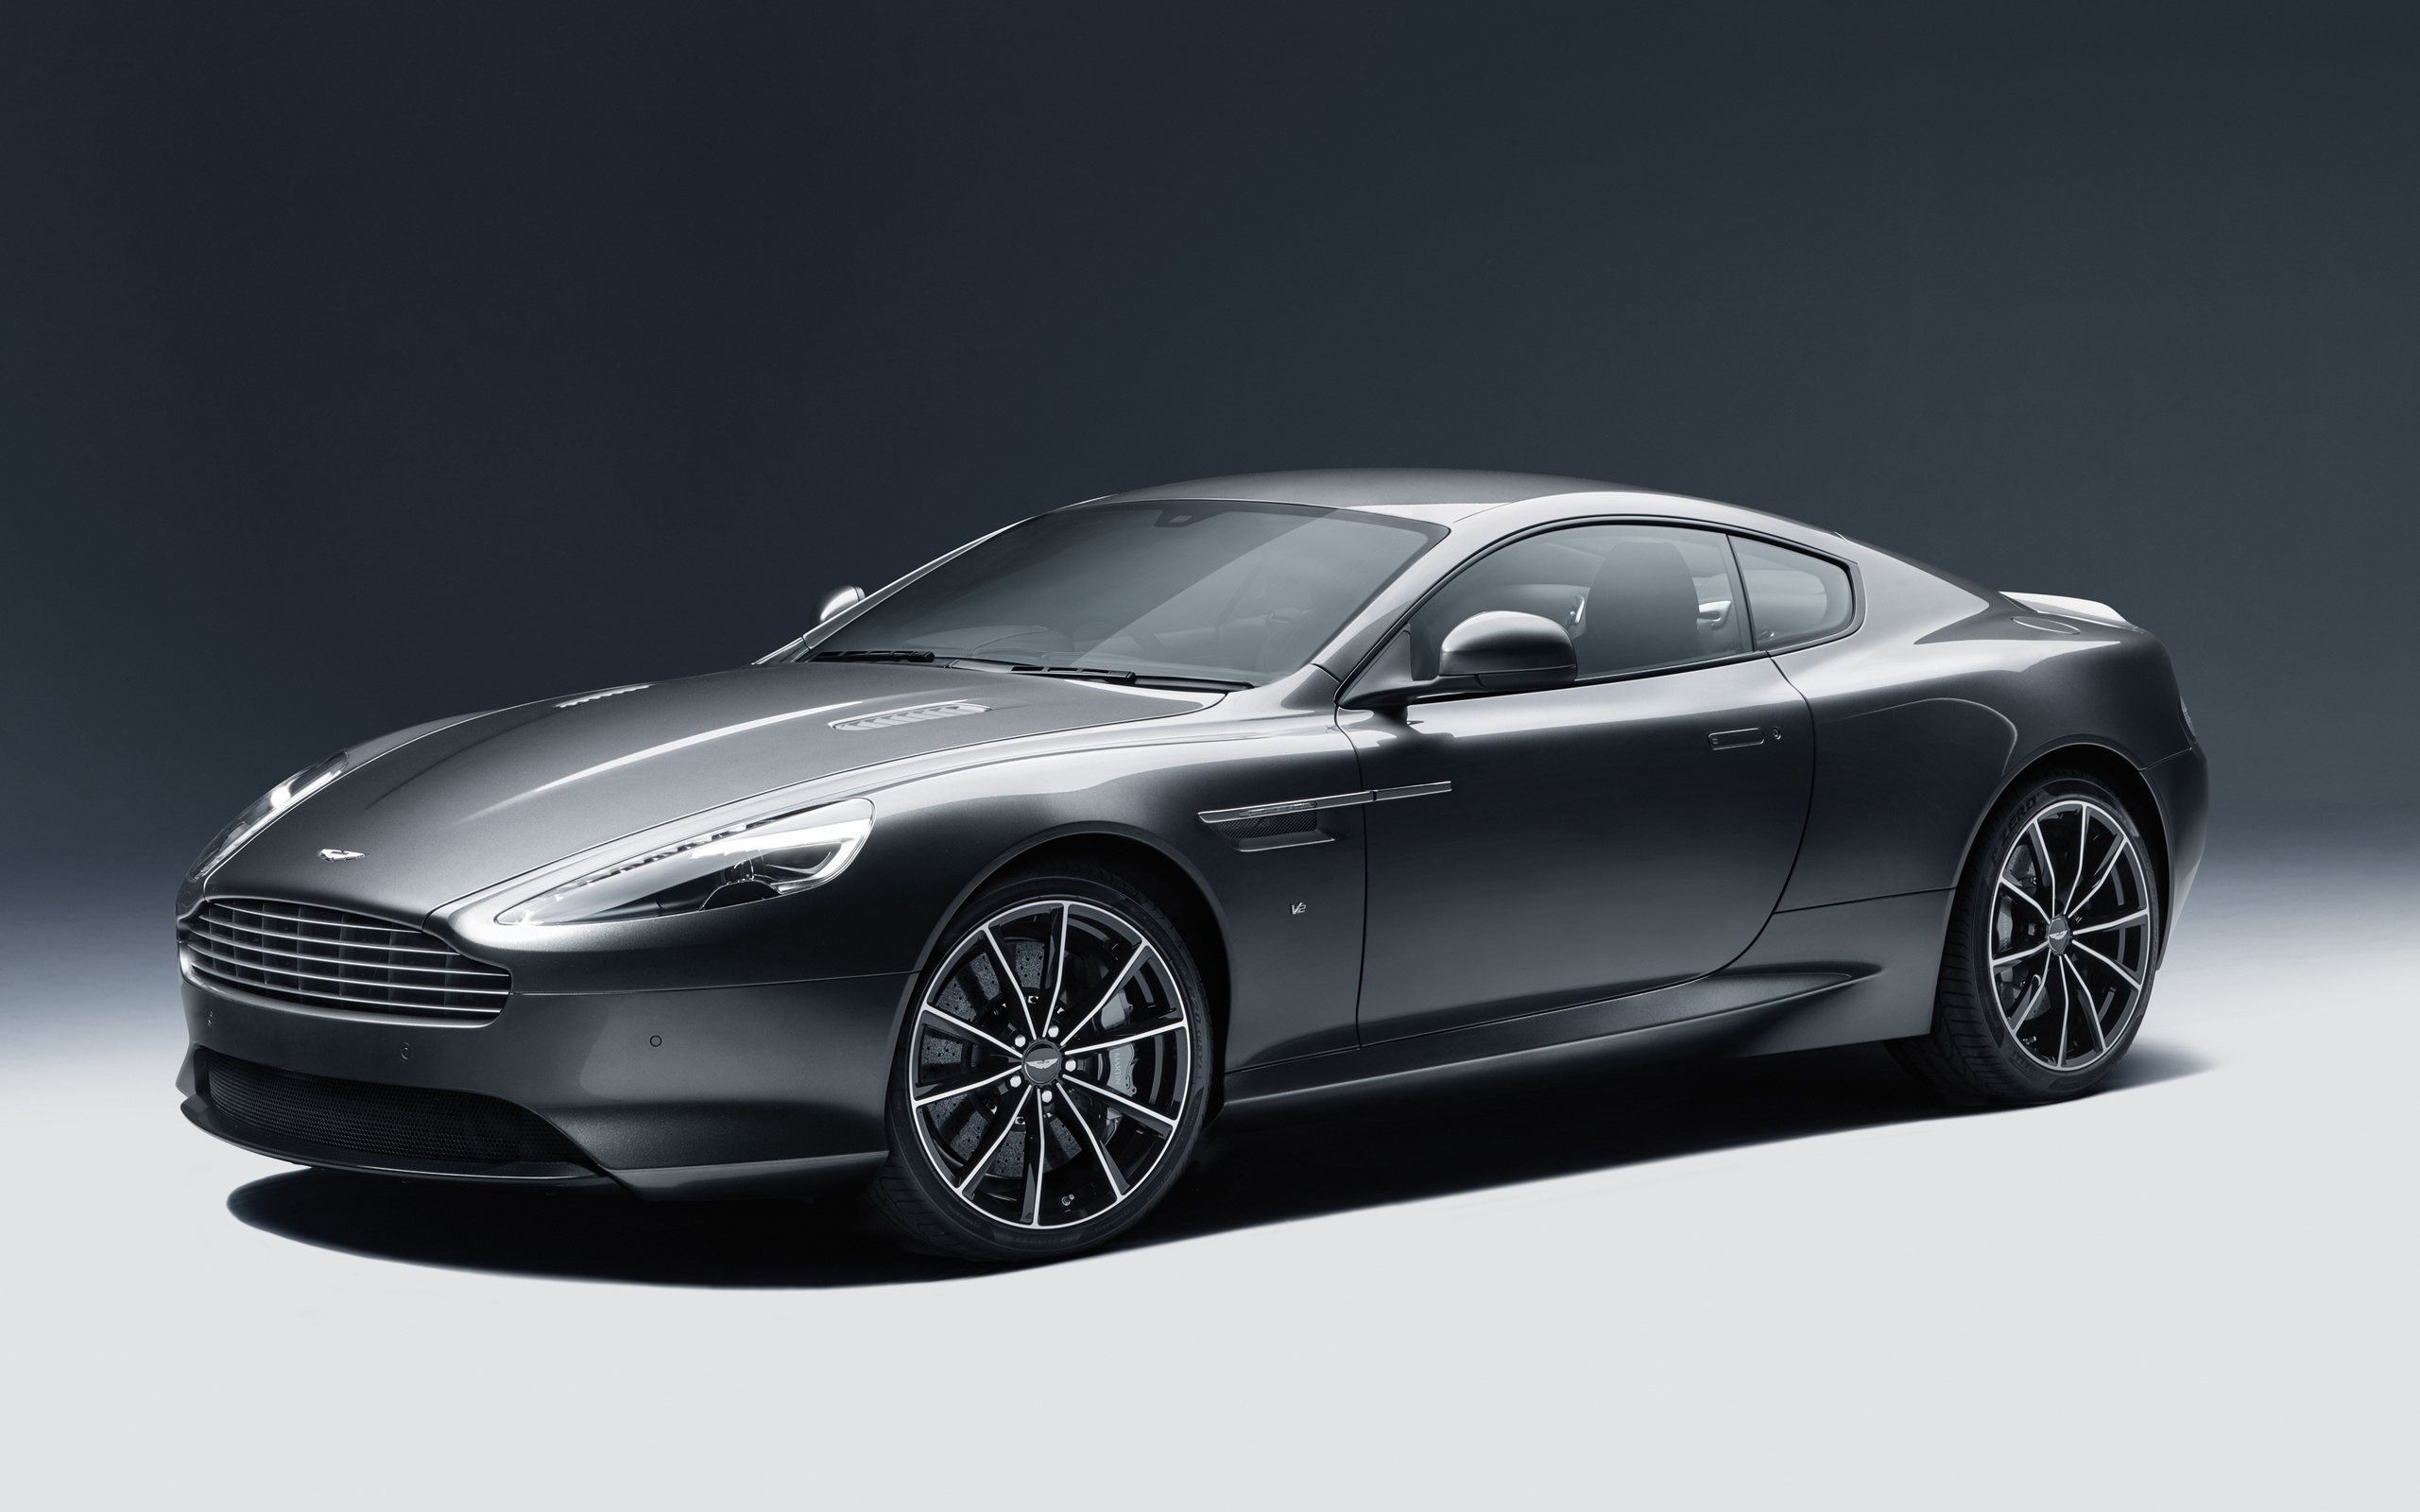 Aston Martin DB9 GT 4K Ultra HD wallpaper 4k WallpaperNet 2561x1600